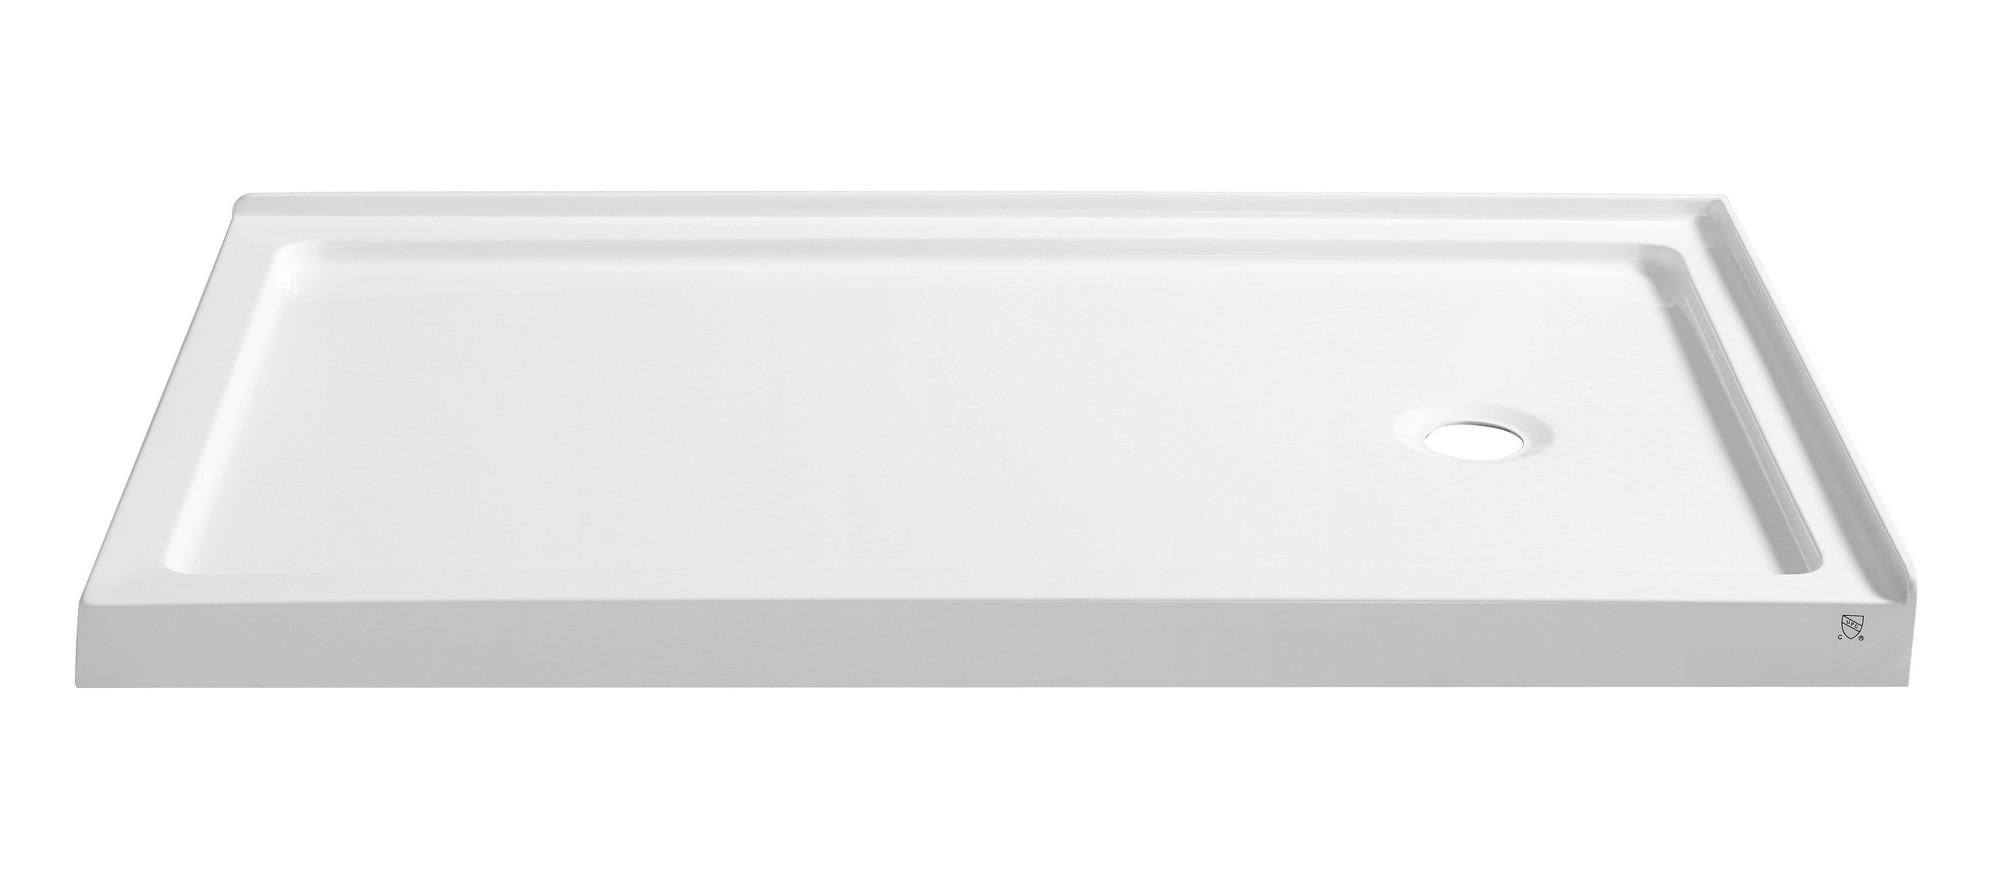 Anzzi SB-AZ008WR Nautilus Series 60 in. x 36 in. Shower Base in White